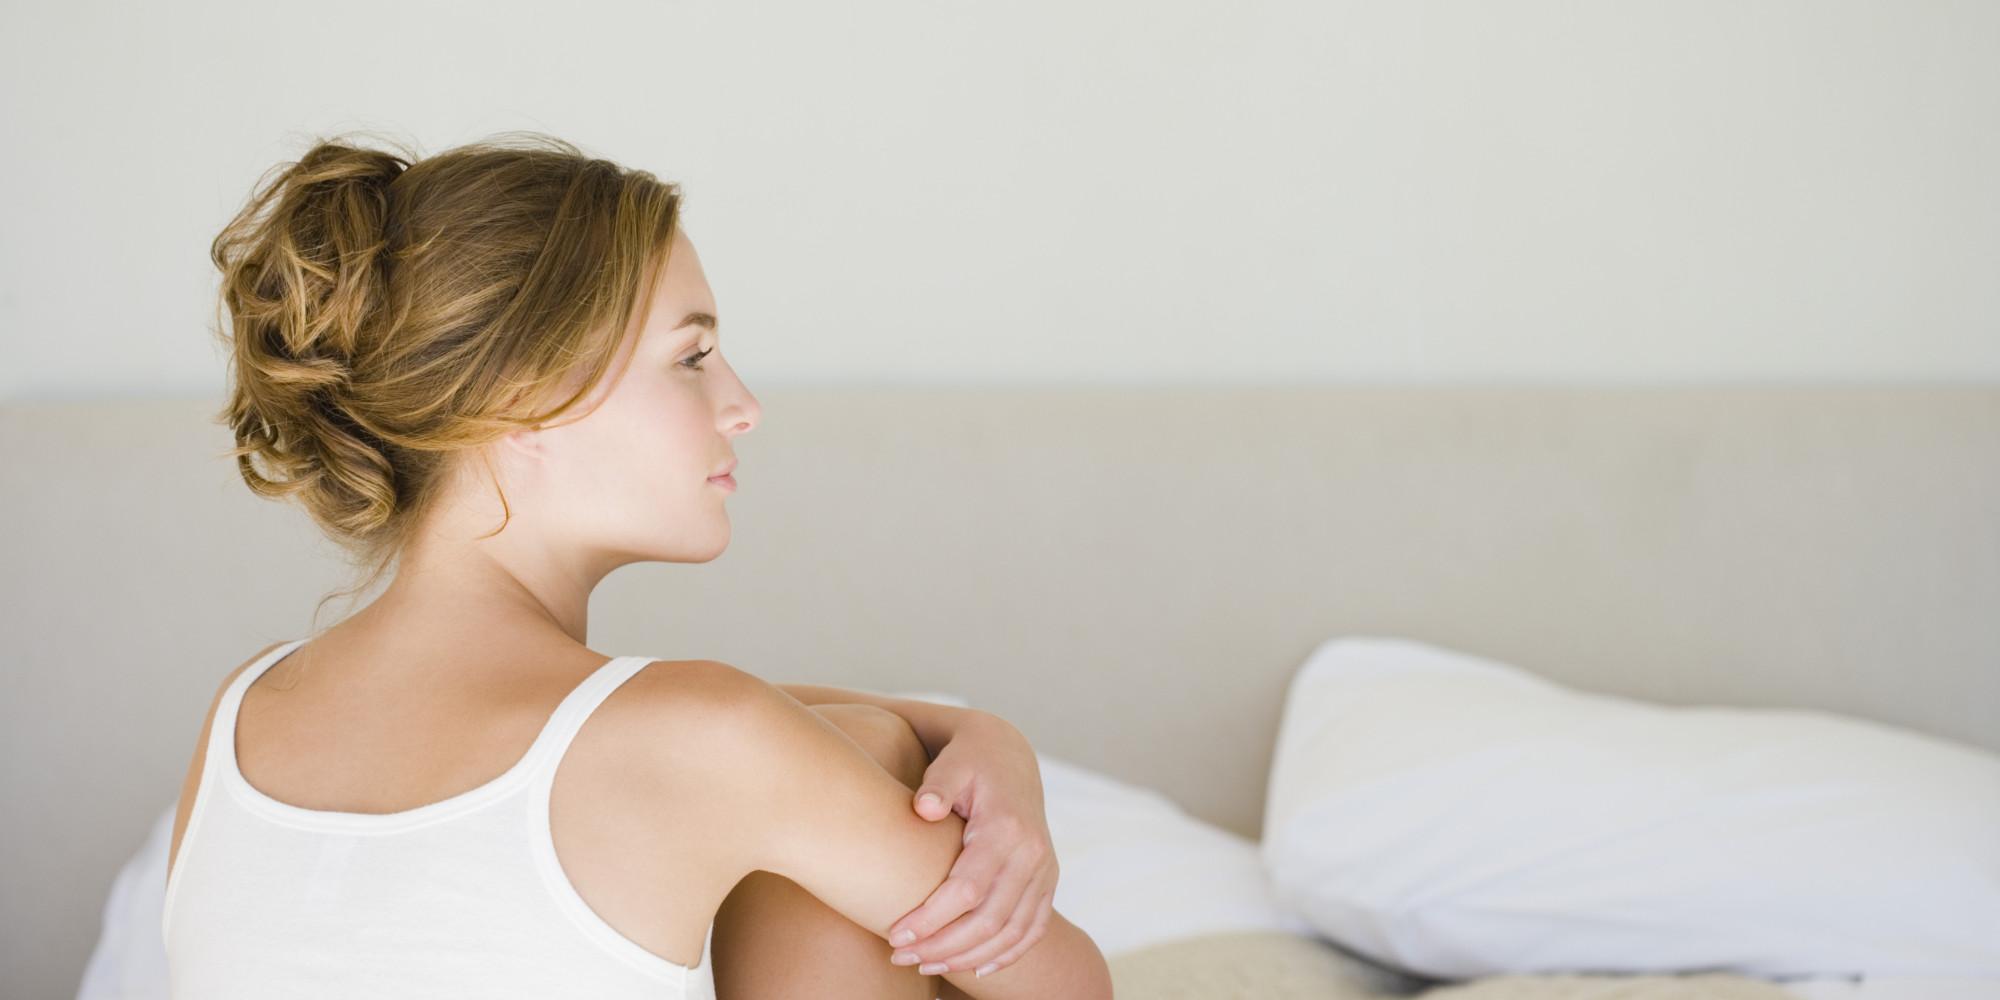 Steve Harvey Has Blunt Advice For A Married Couple Who Sleep In